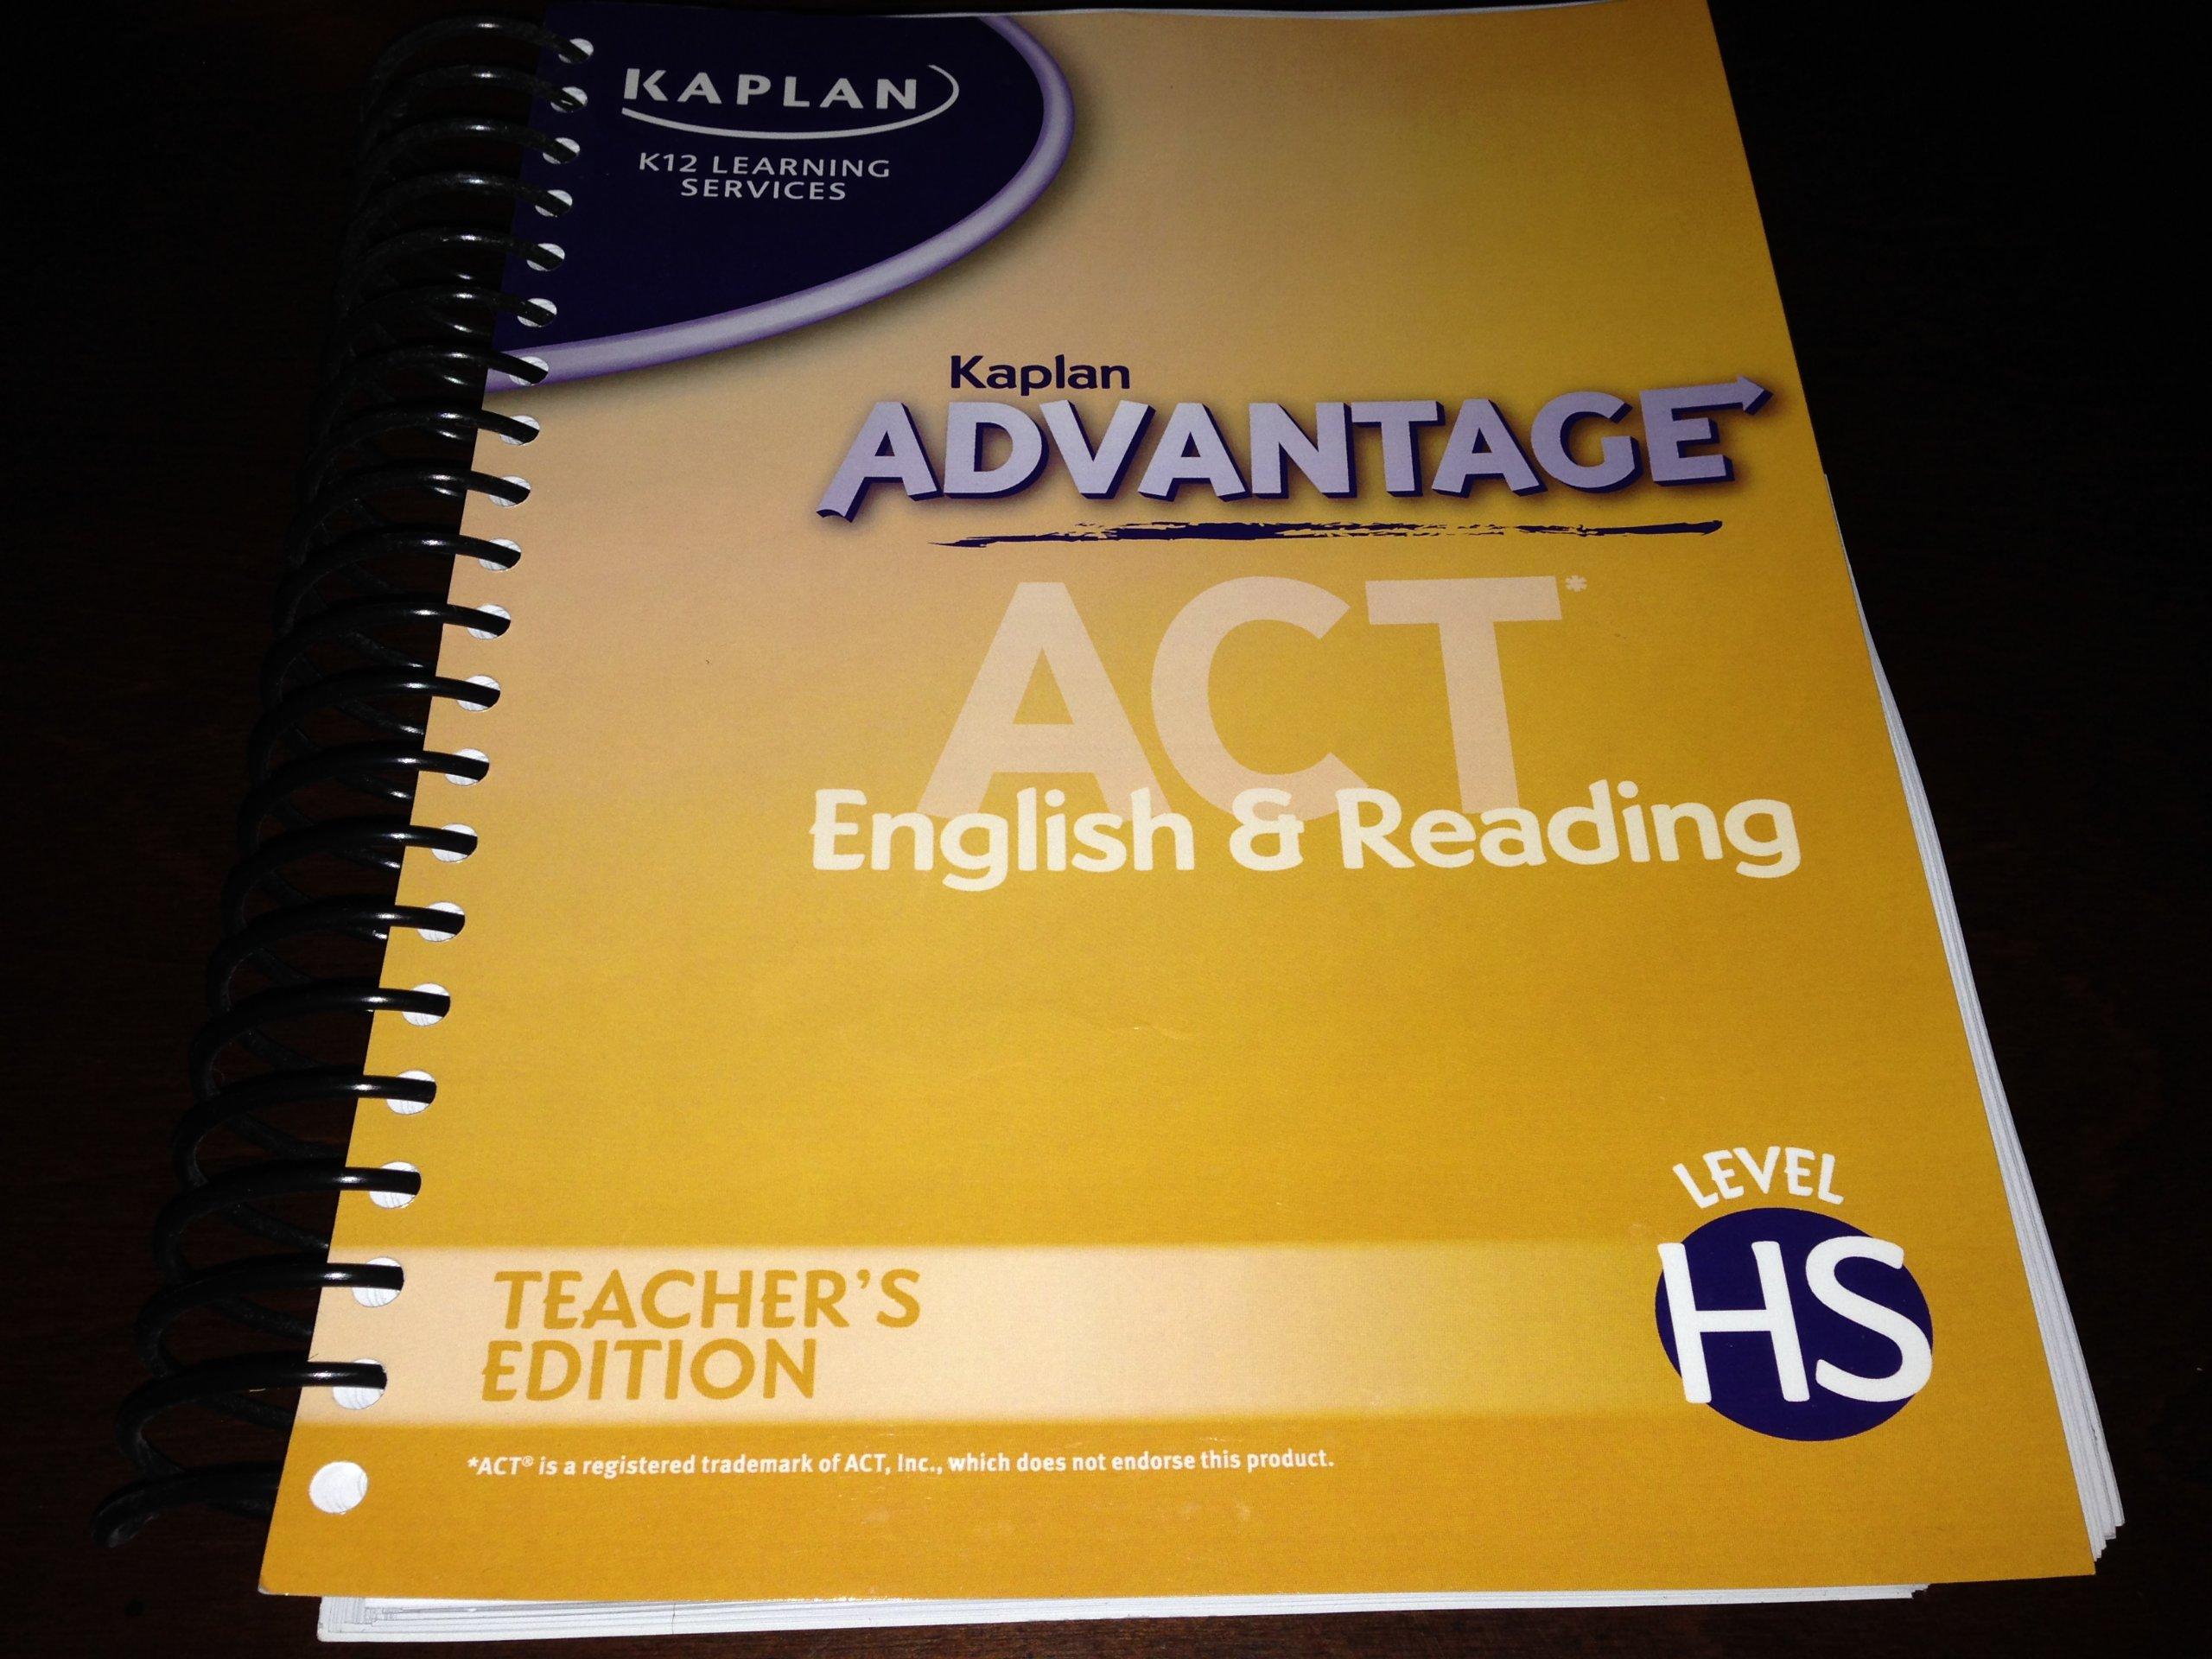 Kaplan advantage act k12 english reading teacher editon level kaplan advantage act k12 english reading teacher editon level hs kaplan k12 learning services 9781580597234 amazon books fandeluxe Images